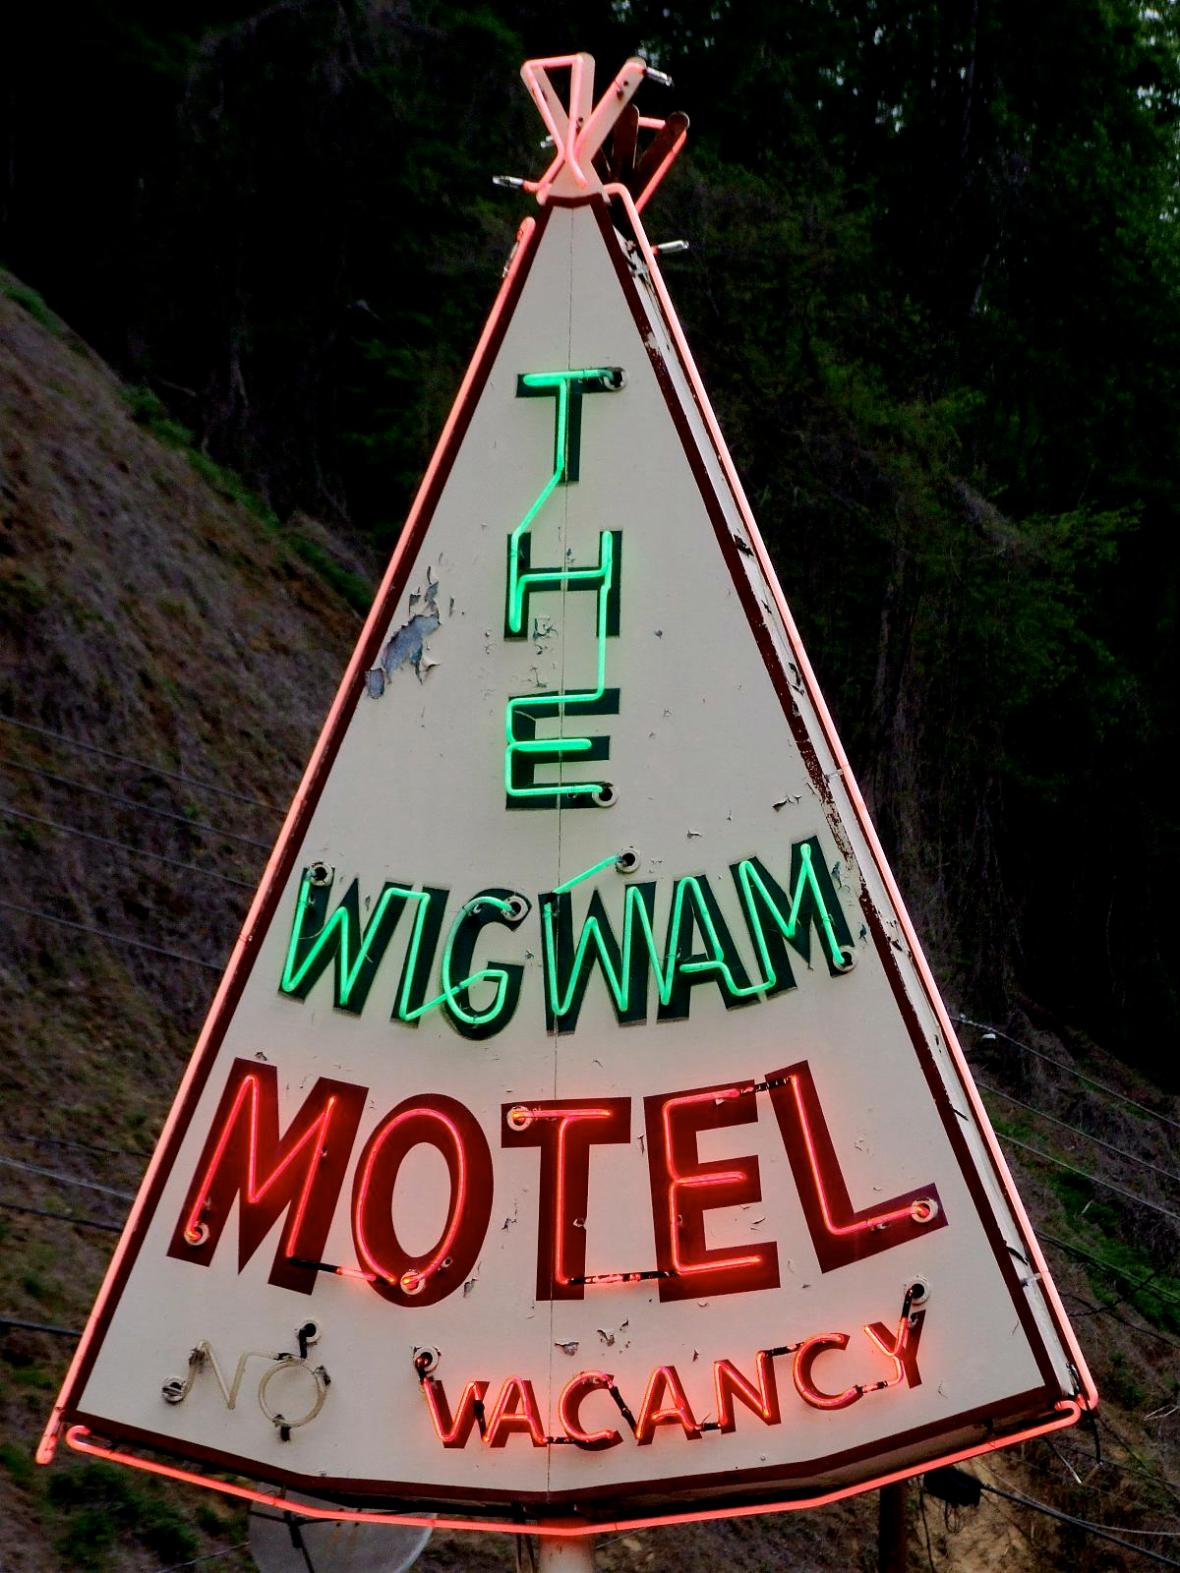 The Wigwam Motel - 1431 Tsali Boulevard, Cherokee, North Carolina U.S.A. - May 3, 2008